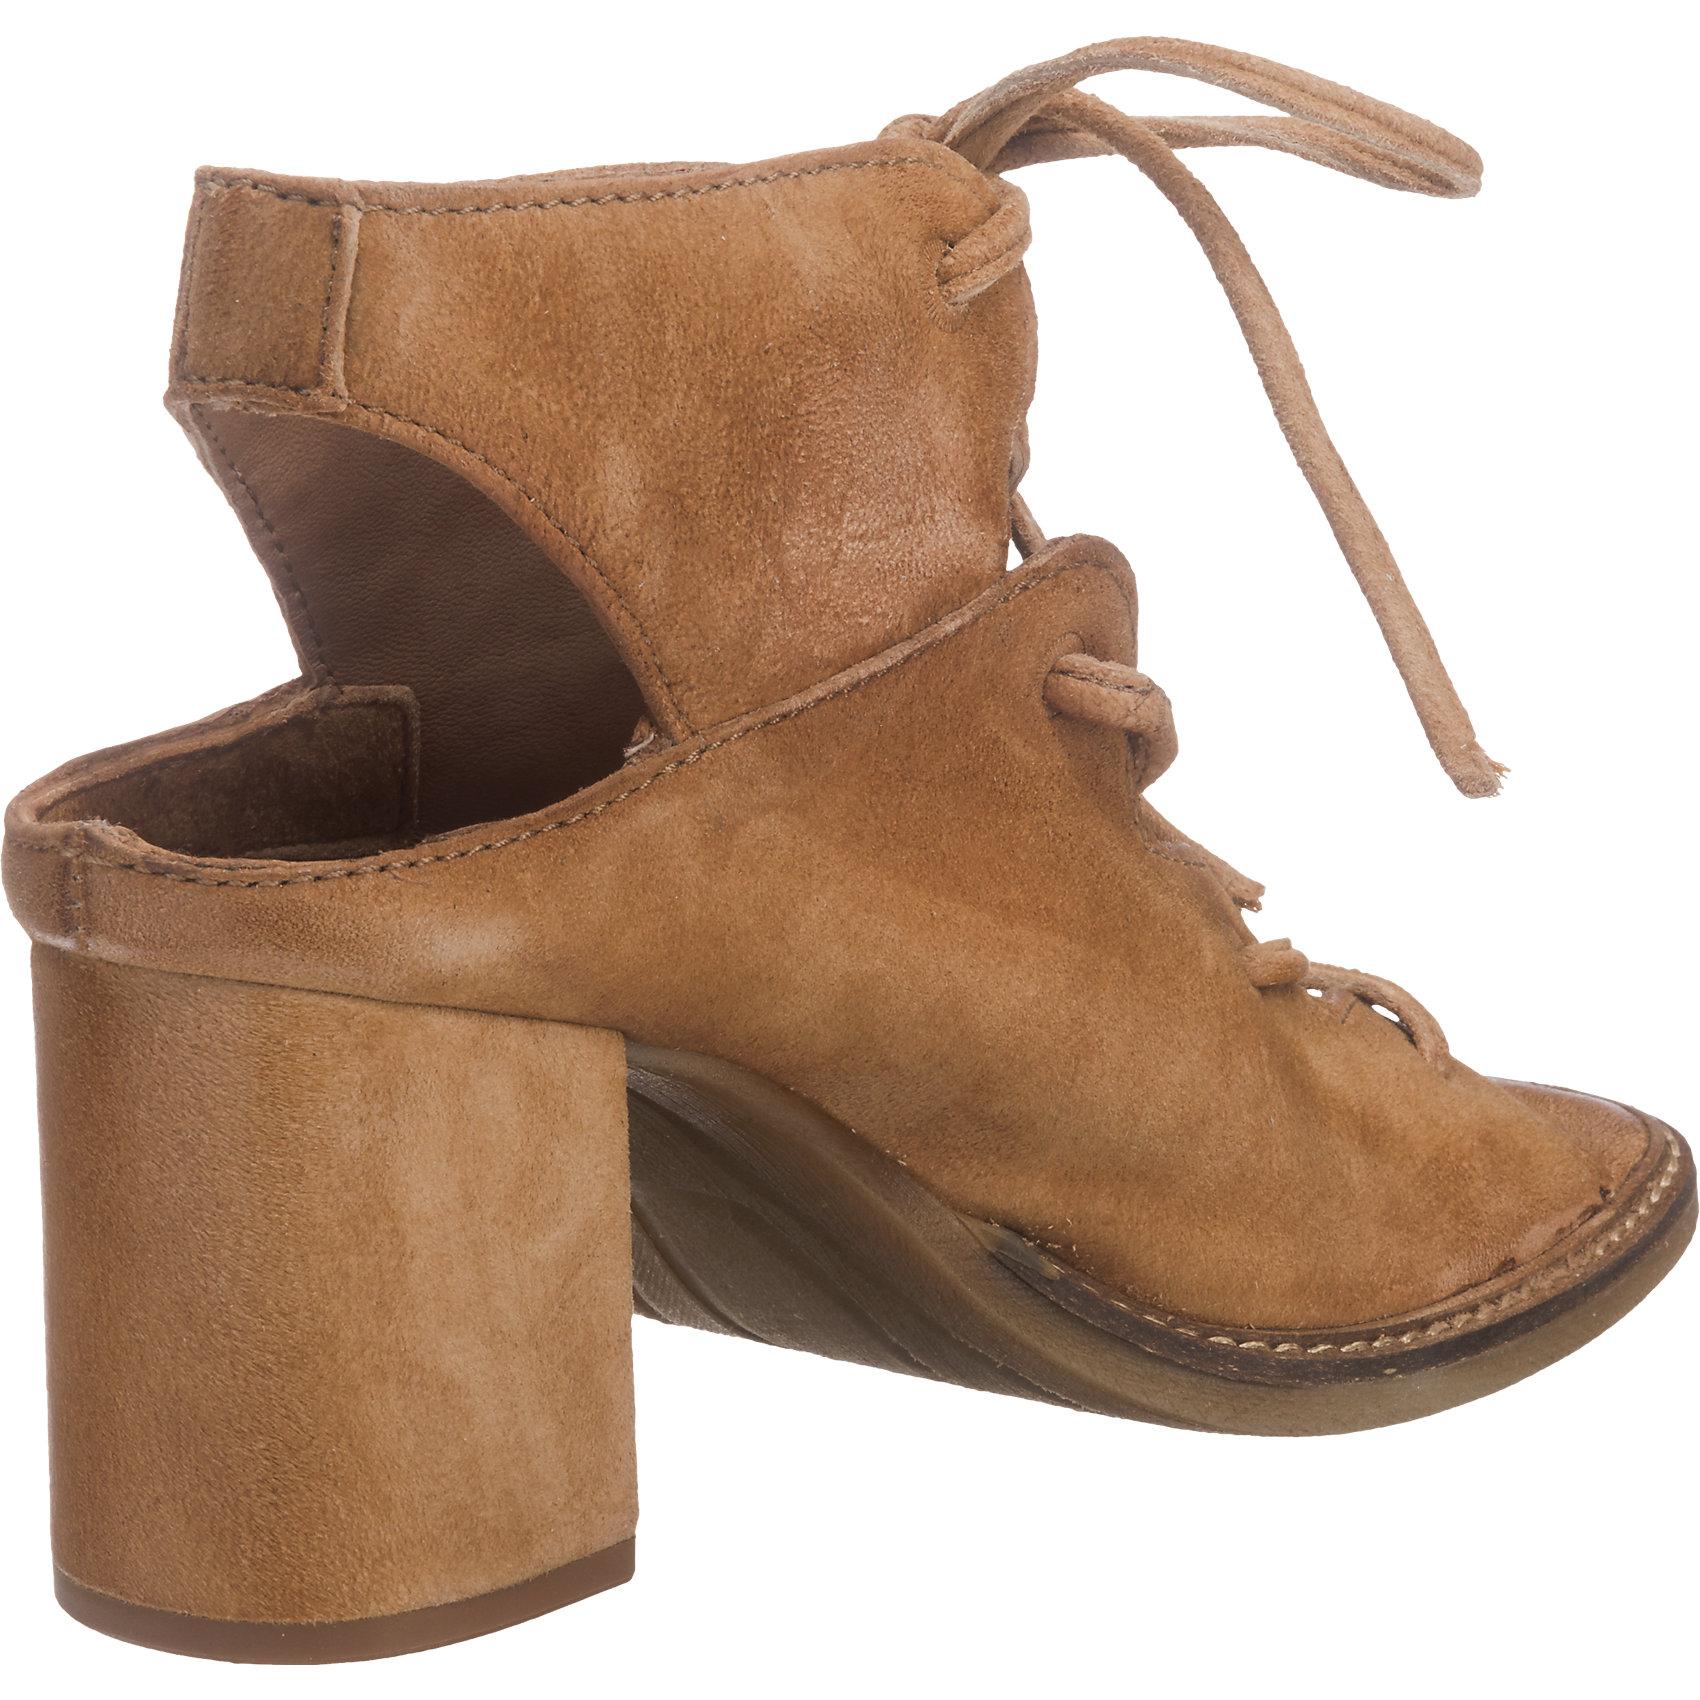 Neu MJUS Close Sandaletten braun 5770286